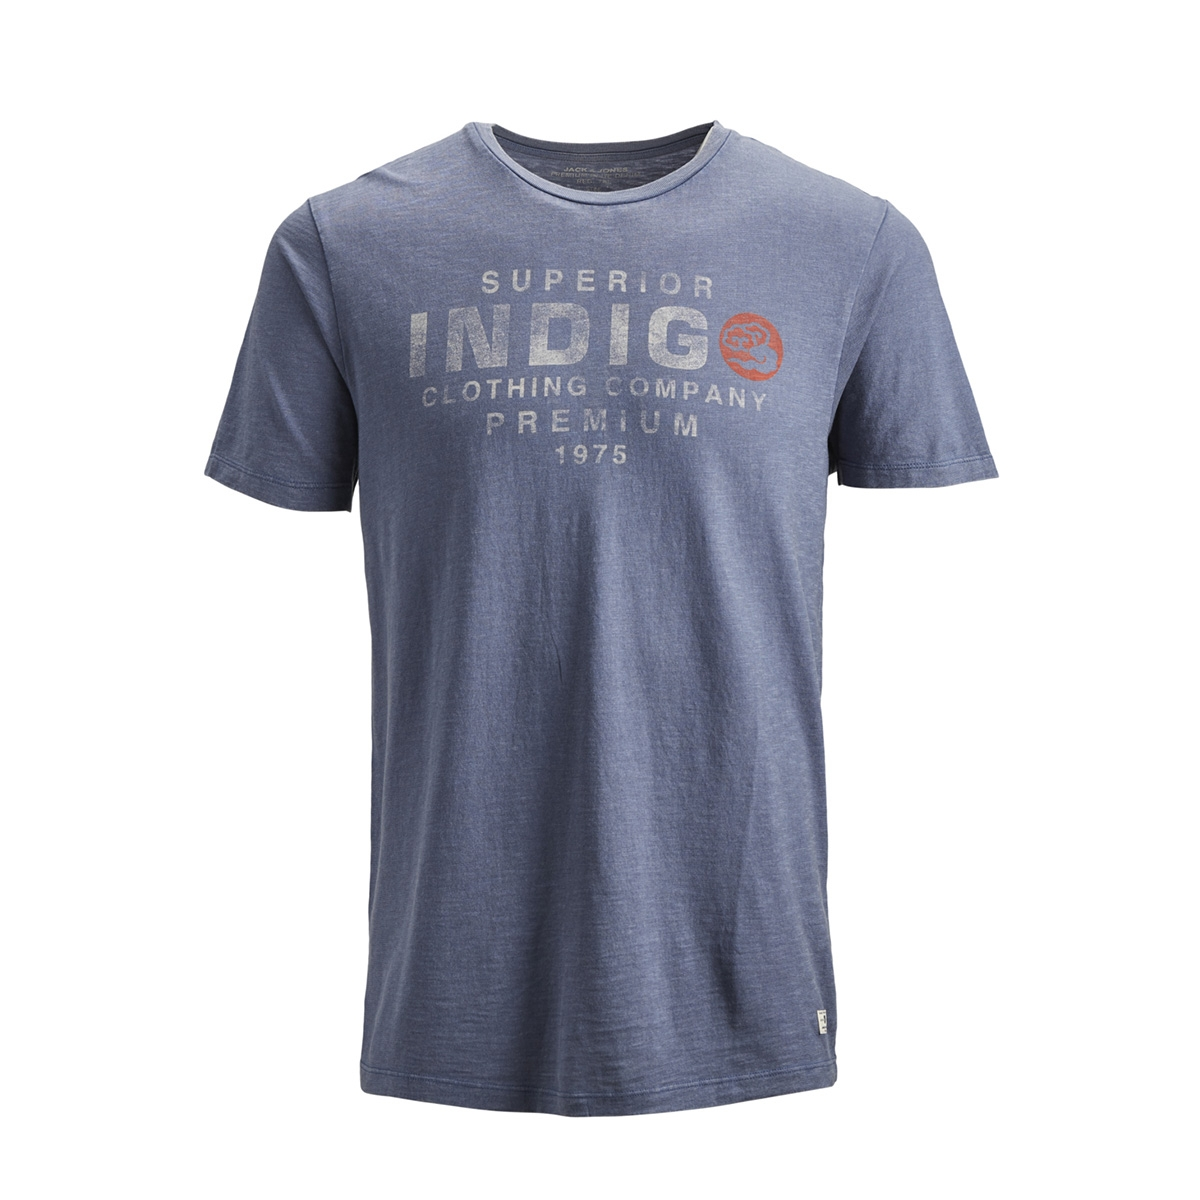 jprkeith blu. tee ss crew neck 12154622 jack & jones t-shirt vintage indigo